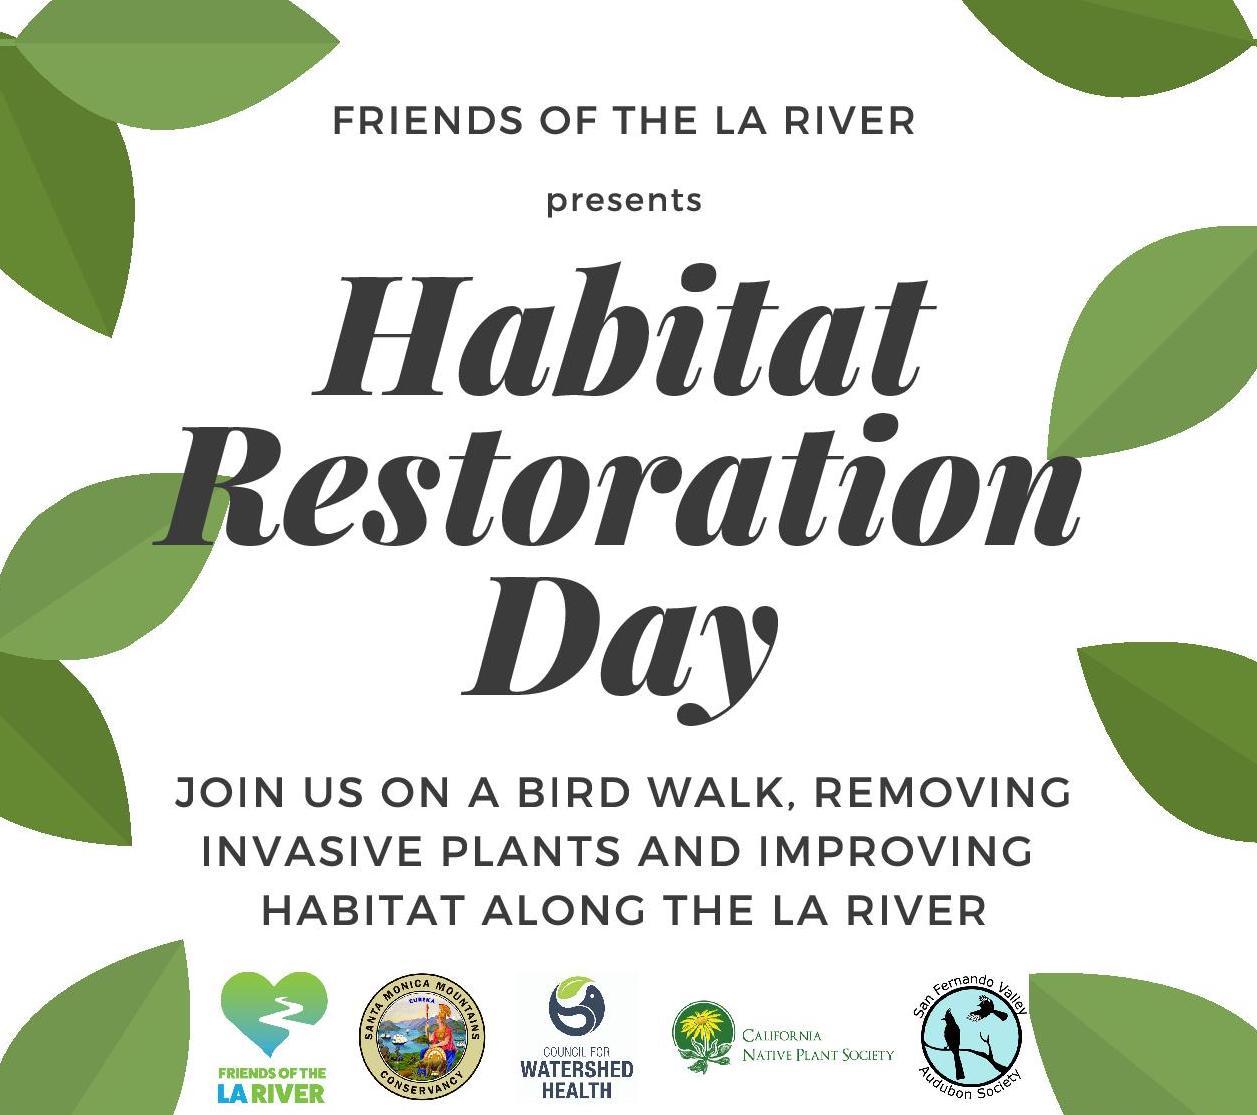 Habitat Restoration Day